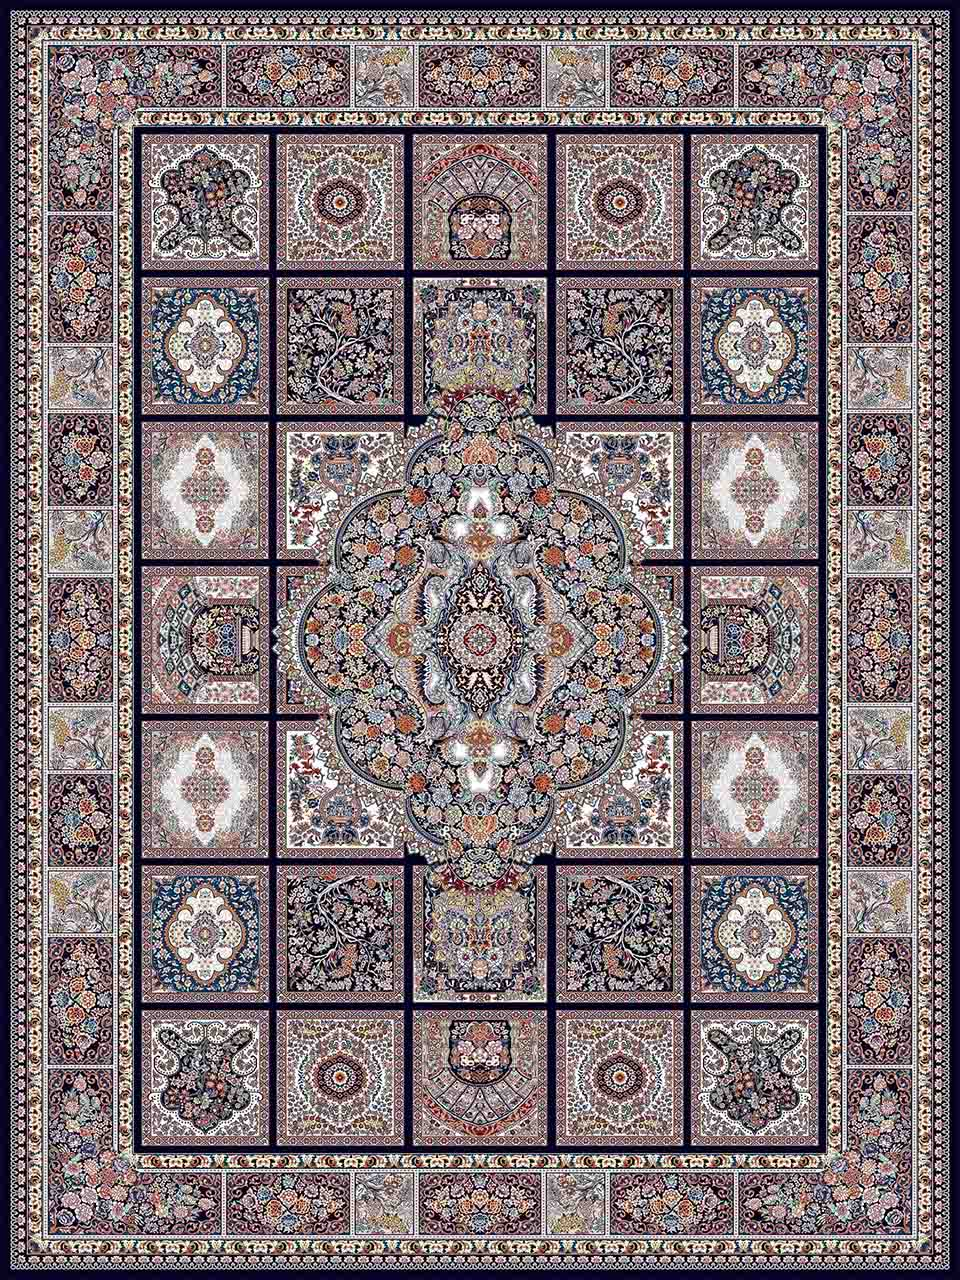 فرش (25040) اکریلیک - 8 رنگ - 700 شانه - سورمه اي - تراکم 2550